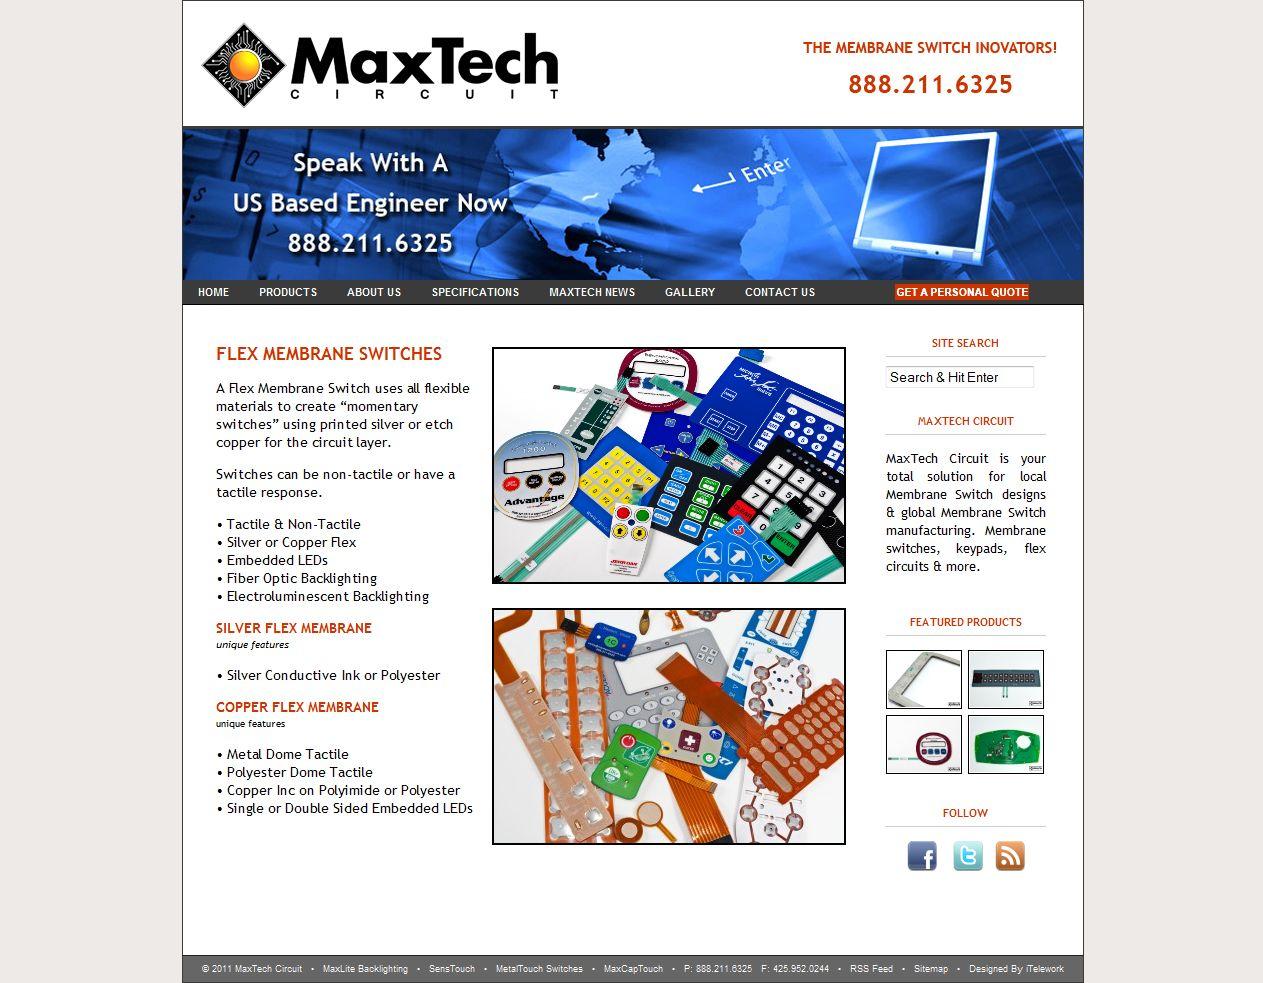 maxtechcircuit-com2_